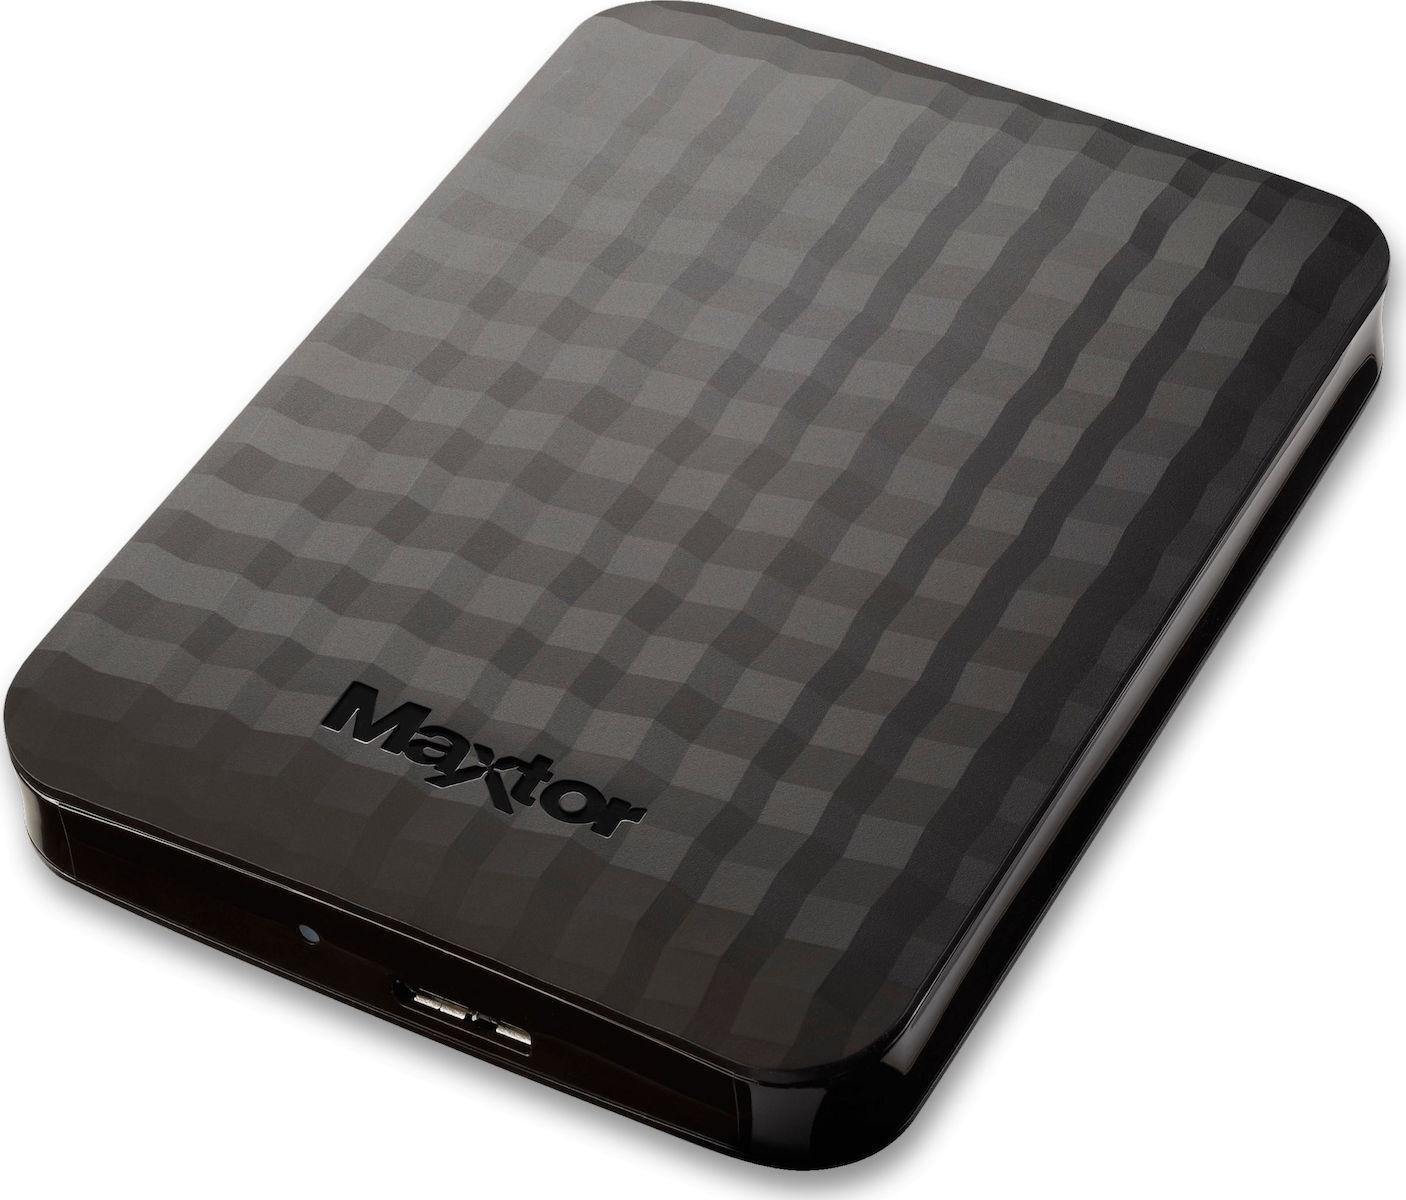 Maxtor M3 Portable 4TB Εξωτερικός Σκληρός Δίσκος USB 3.0